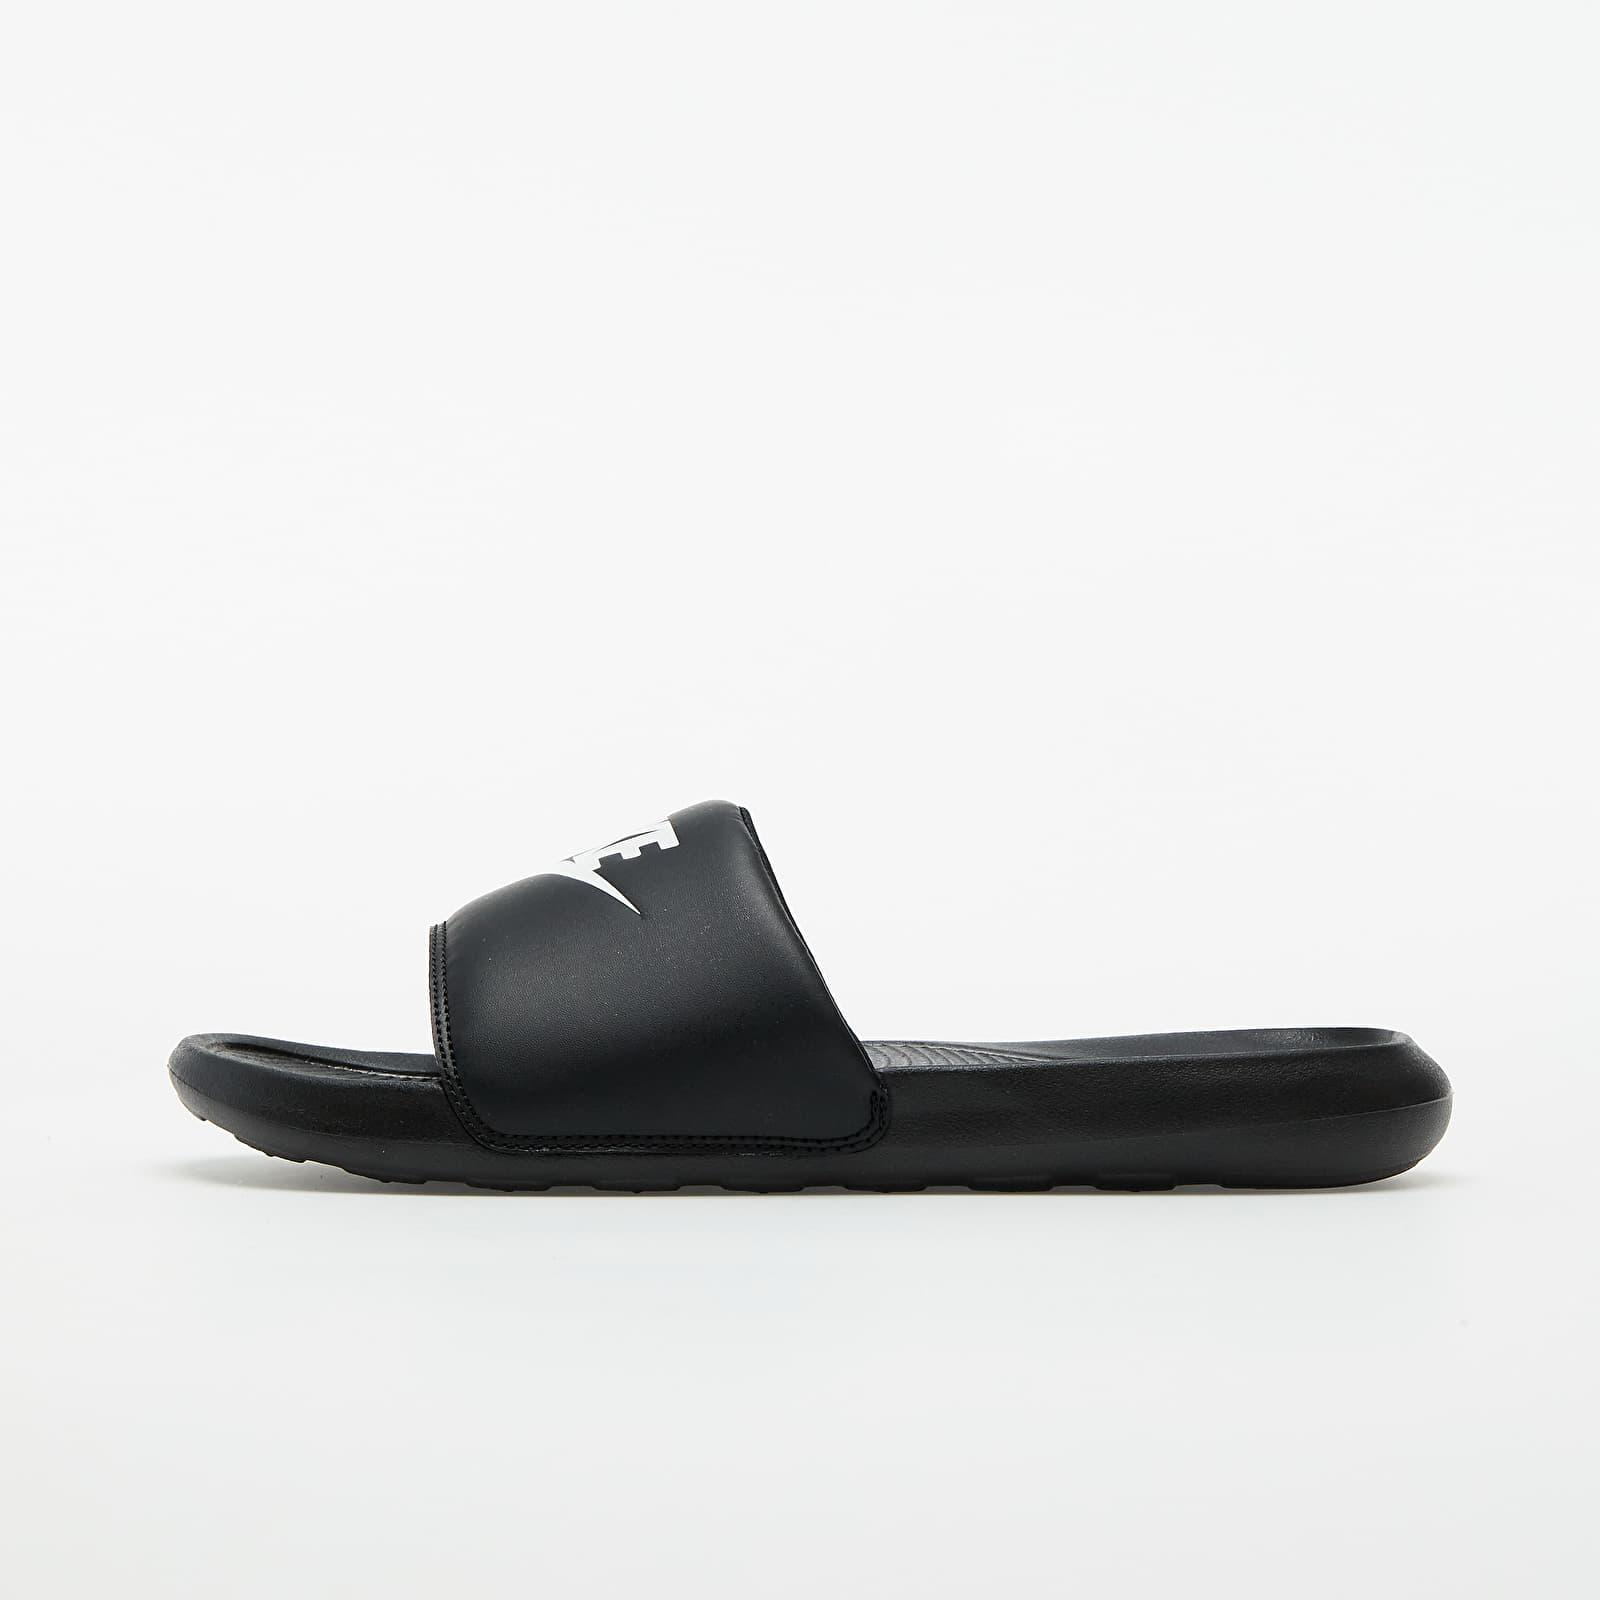 Nike Victori One Slide Black/ White-Black EUR 45